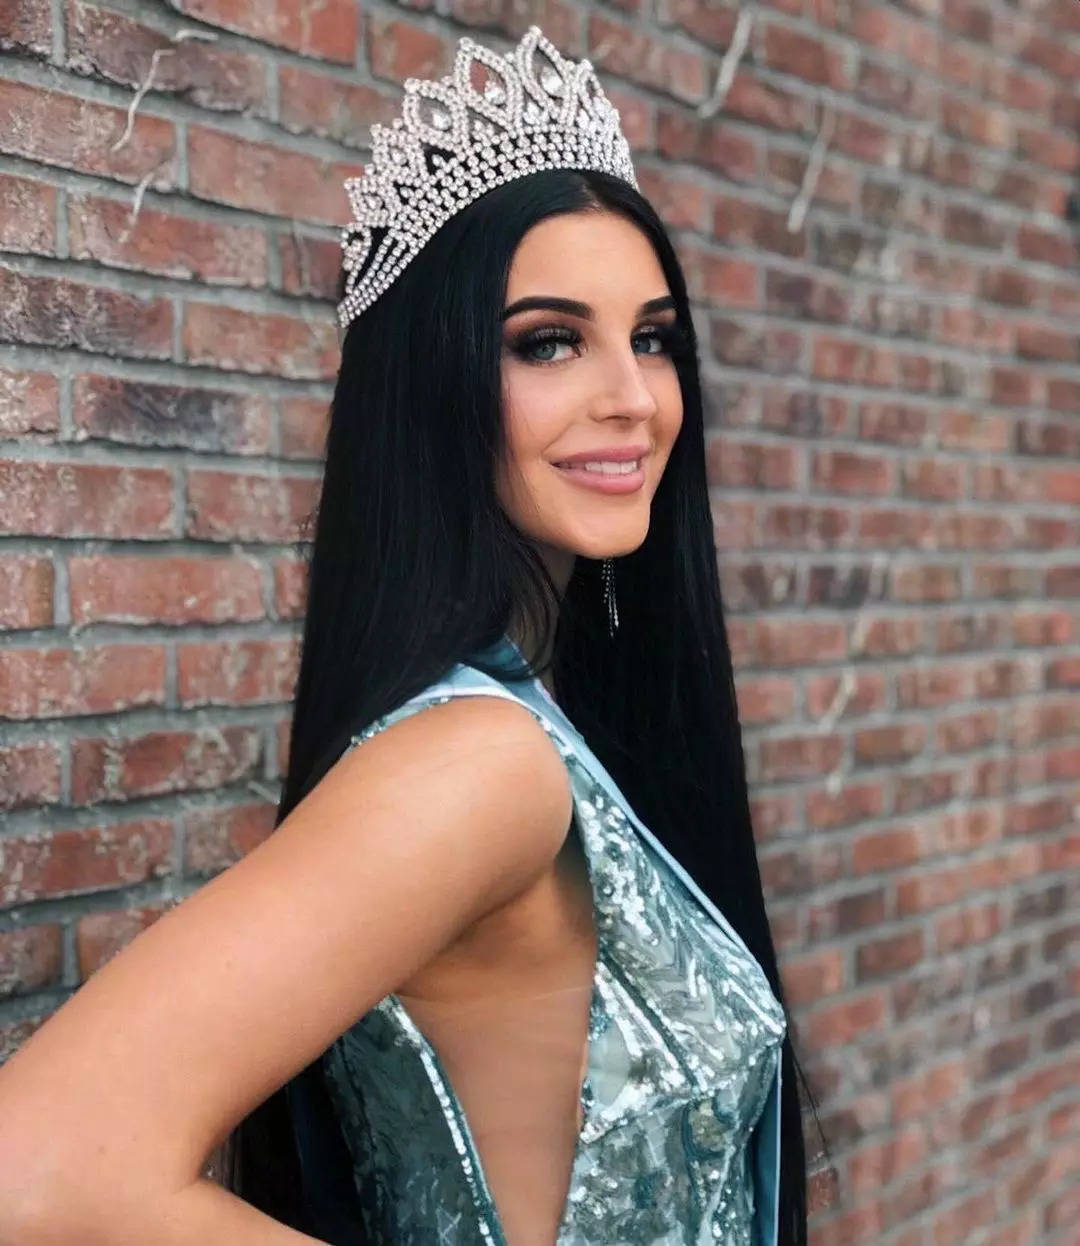 Suzette van der Pol selected as Miss Intercontinental Netherlands 2021